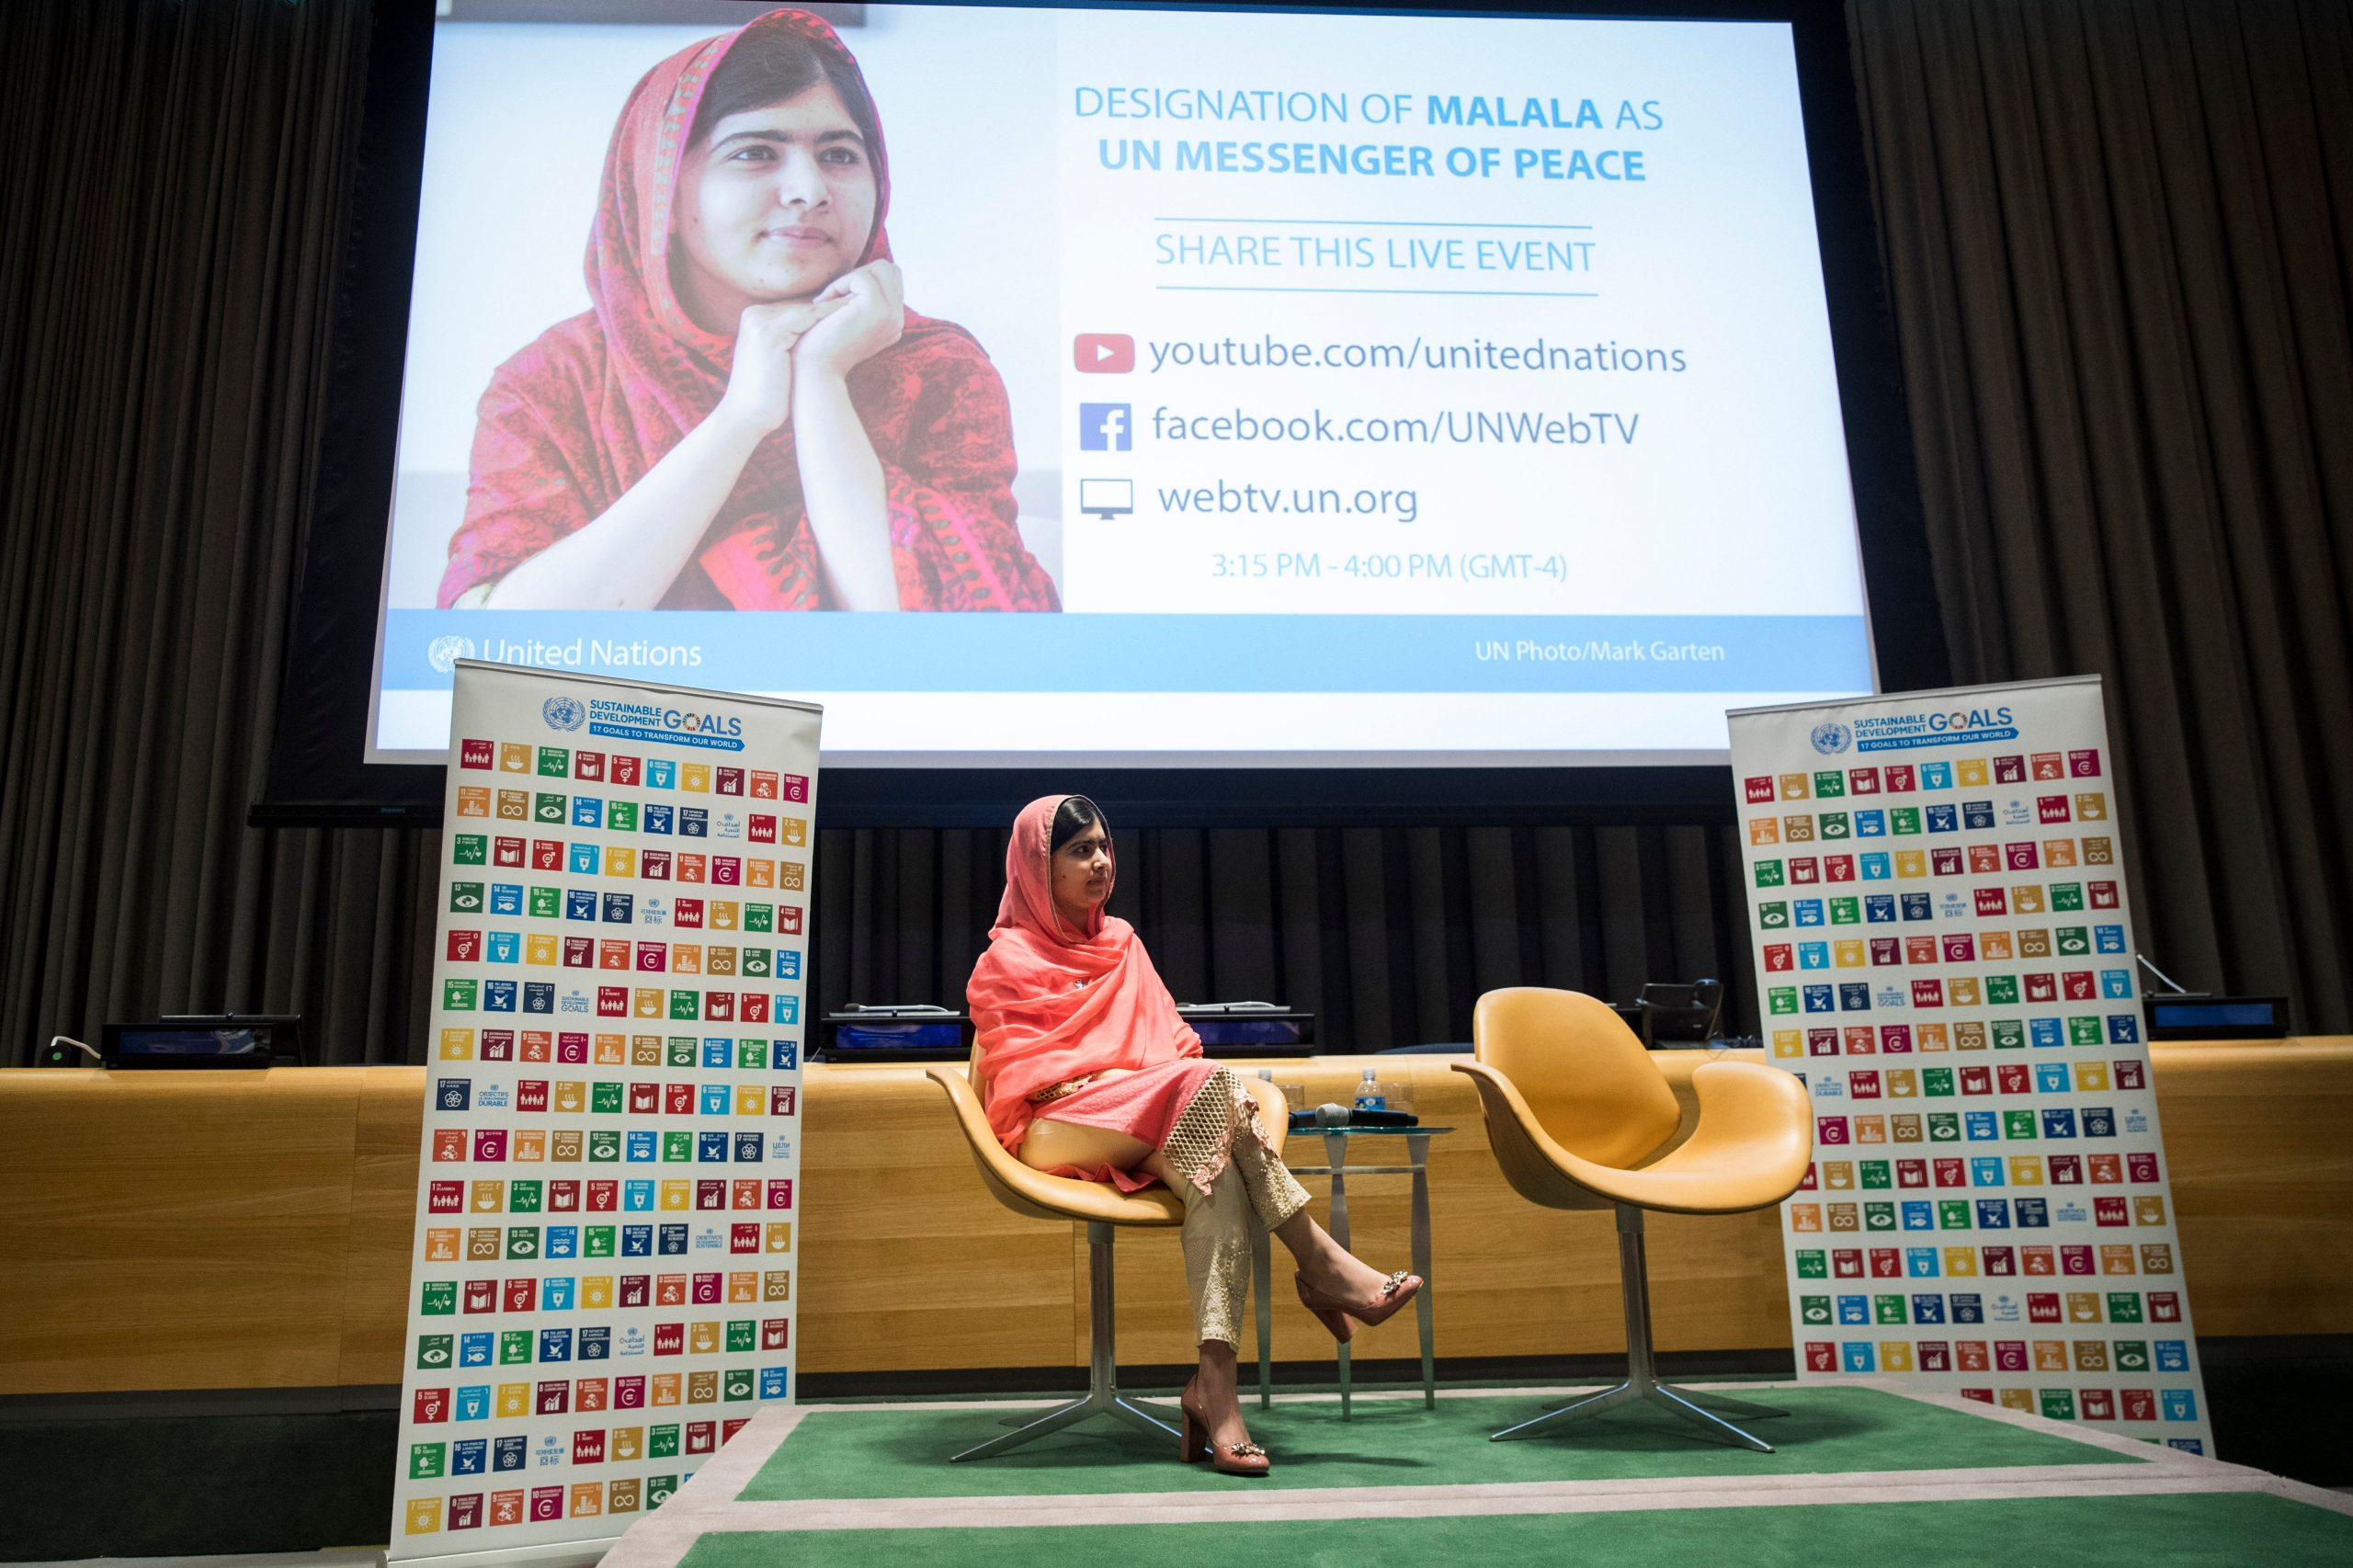 Malala Yousafzai Facts Malala Yousafzai Elevated To United Nations Messenger Of Peace